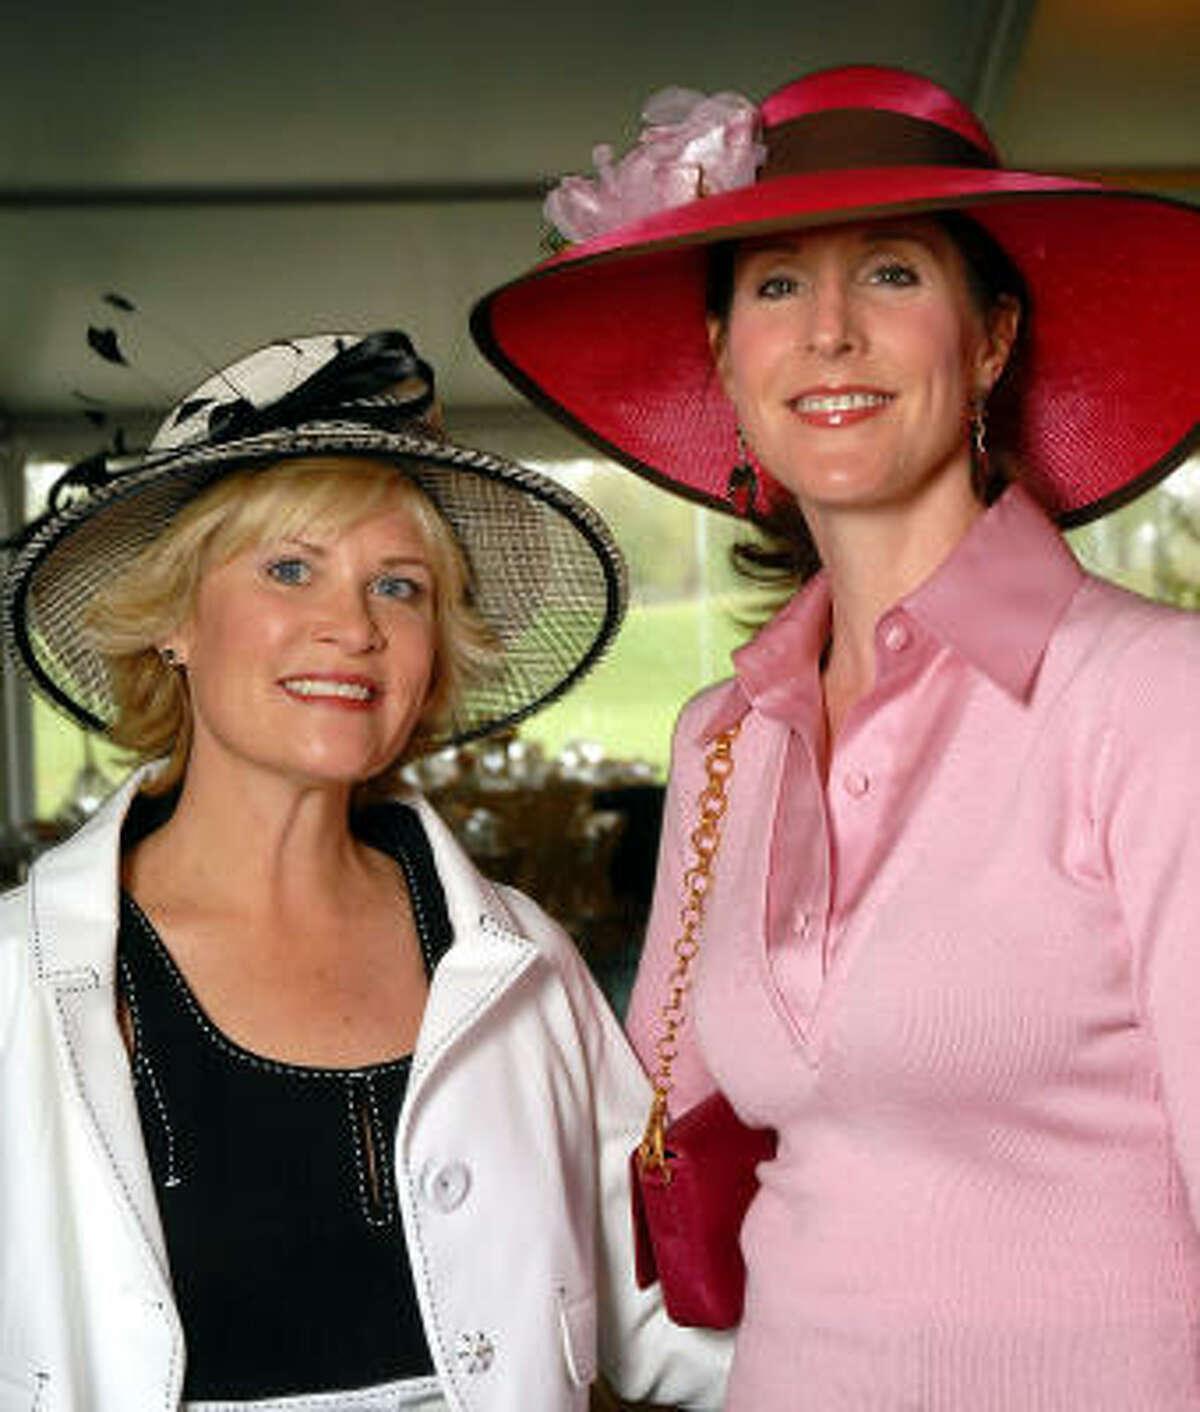 Chairs Kelli Blanton and Phoebe Tudor